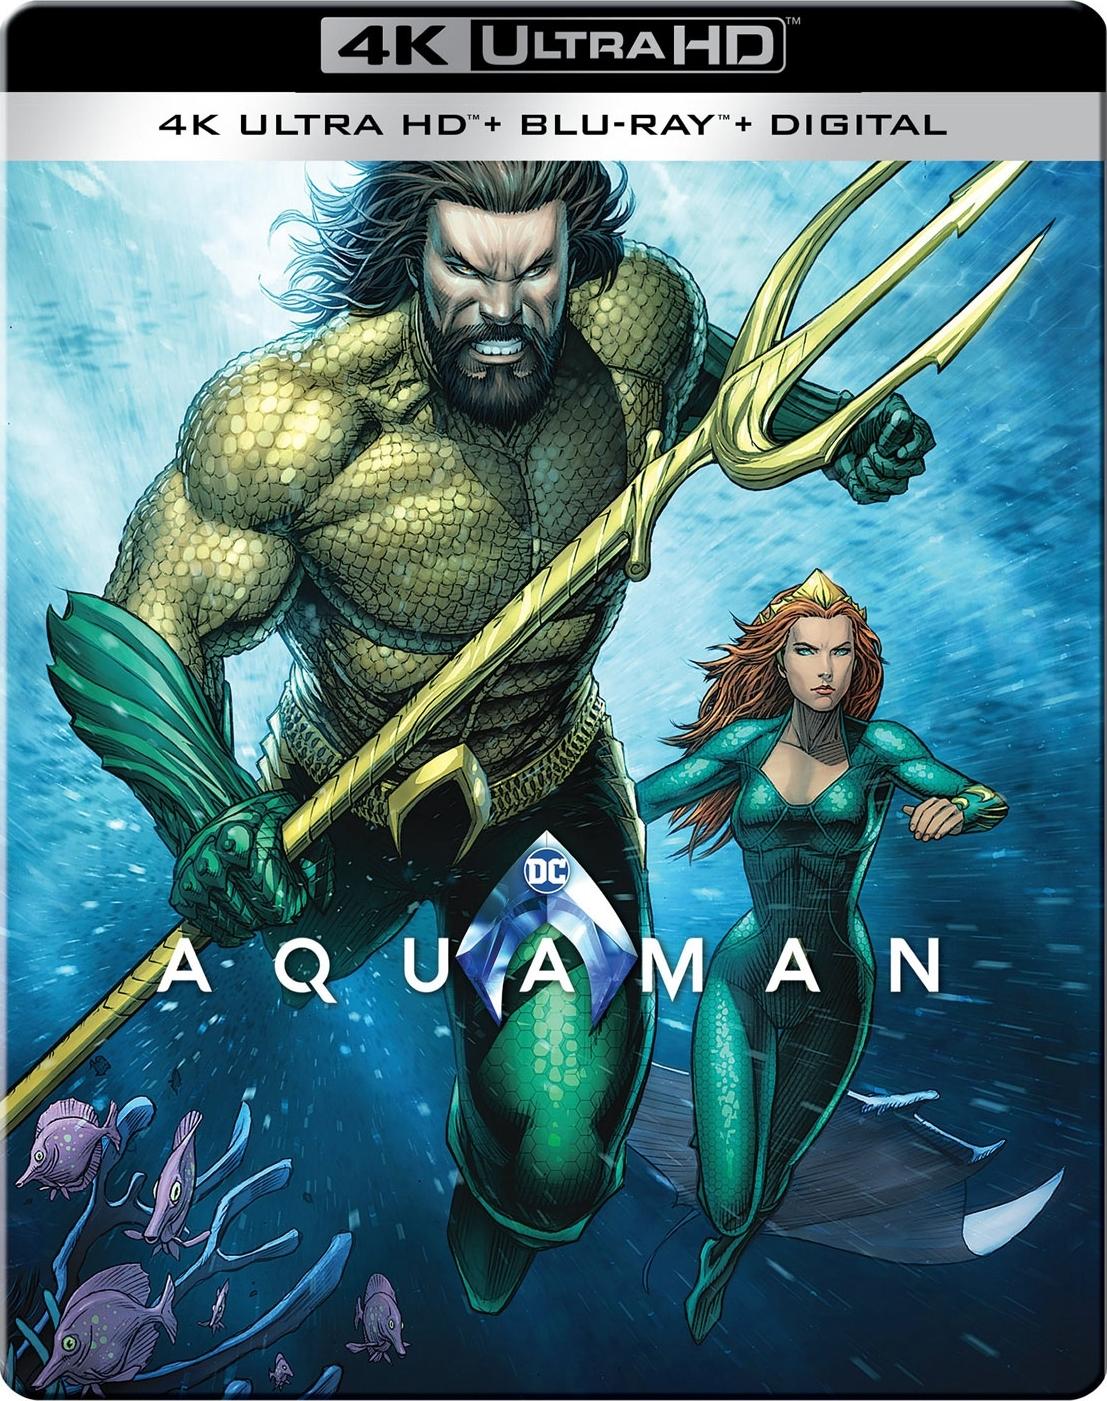 Aquaman (SteelBook)(4K Ultra HD Blu-ray)(Pre-order / Mar 26)